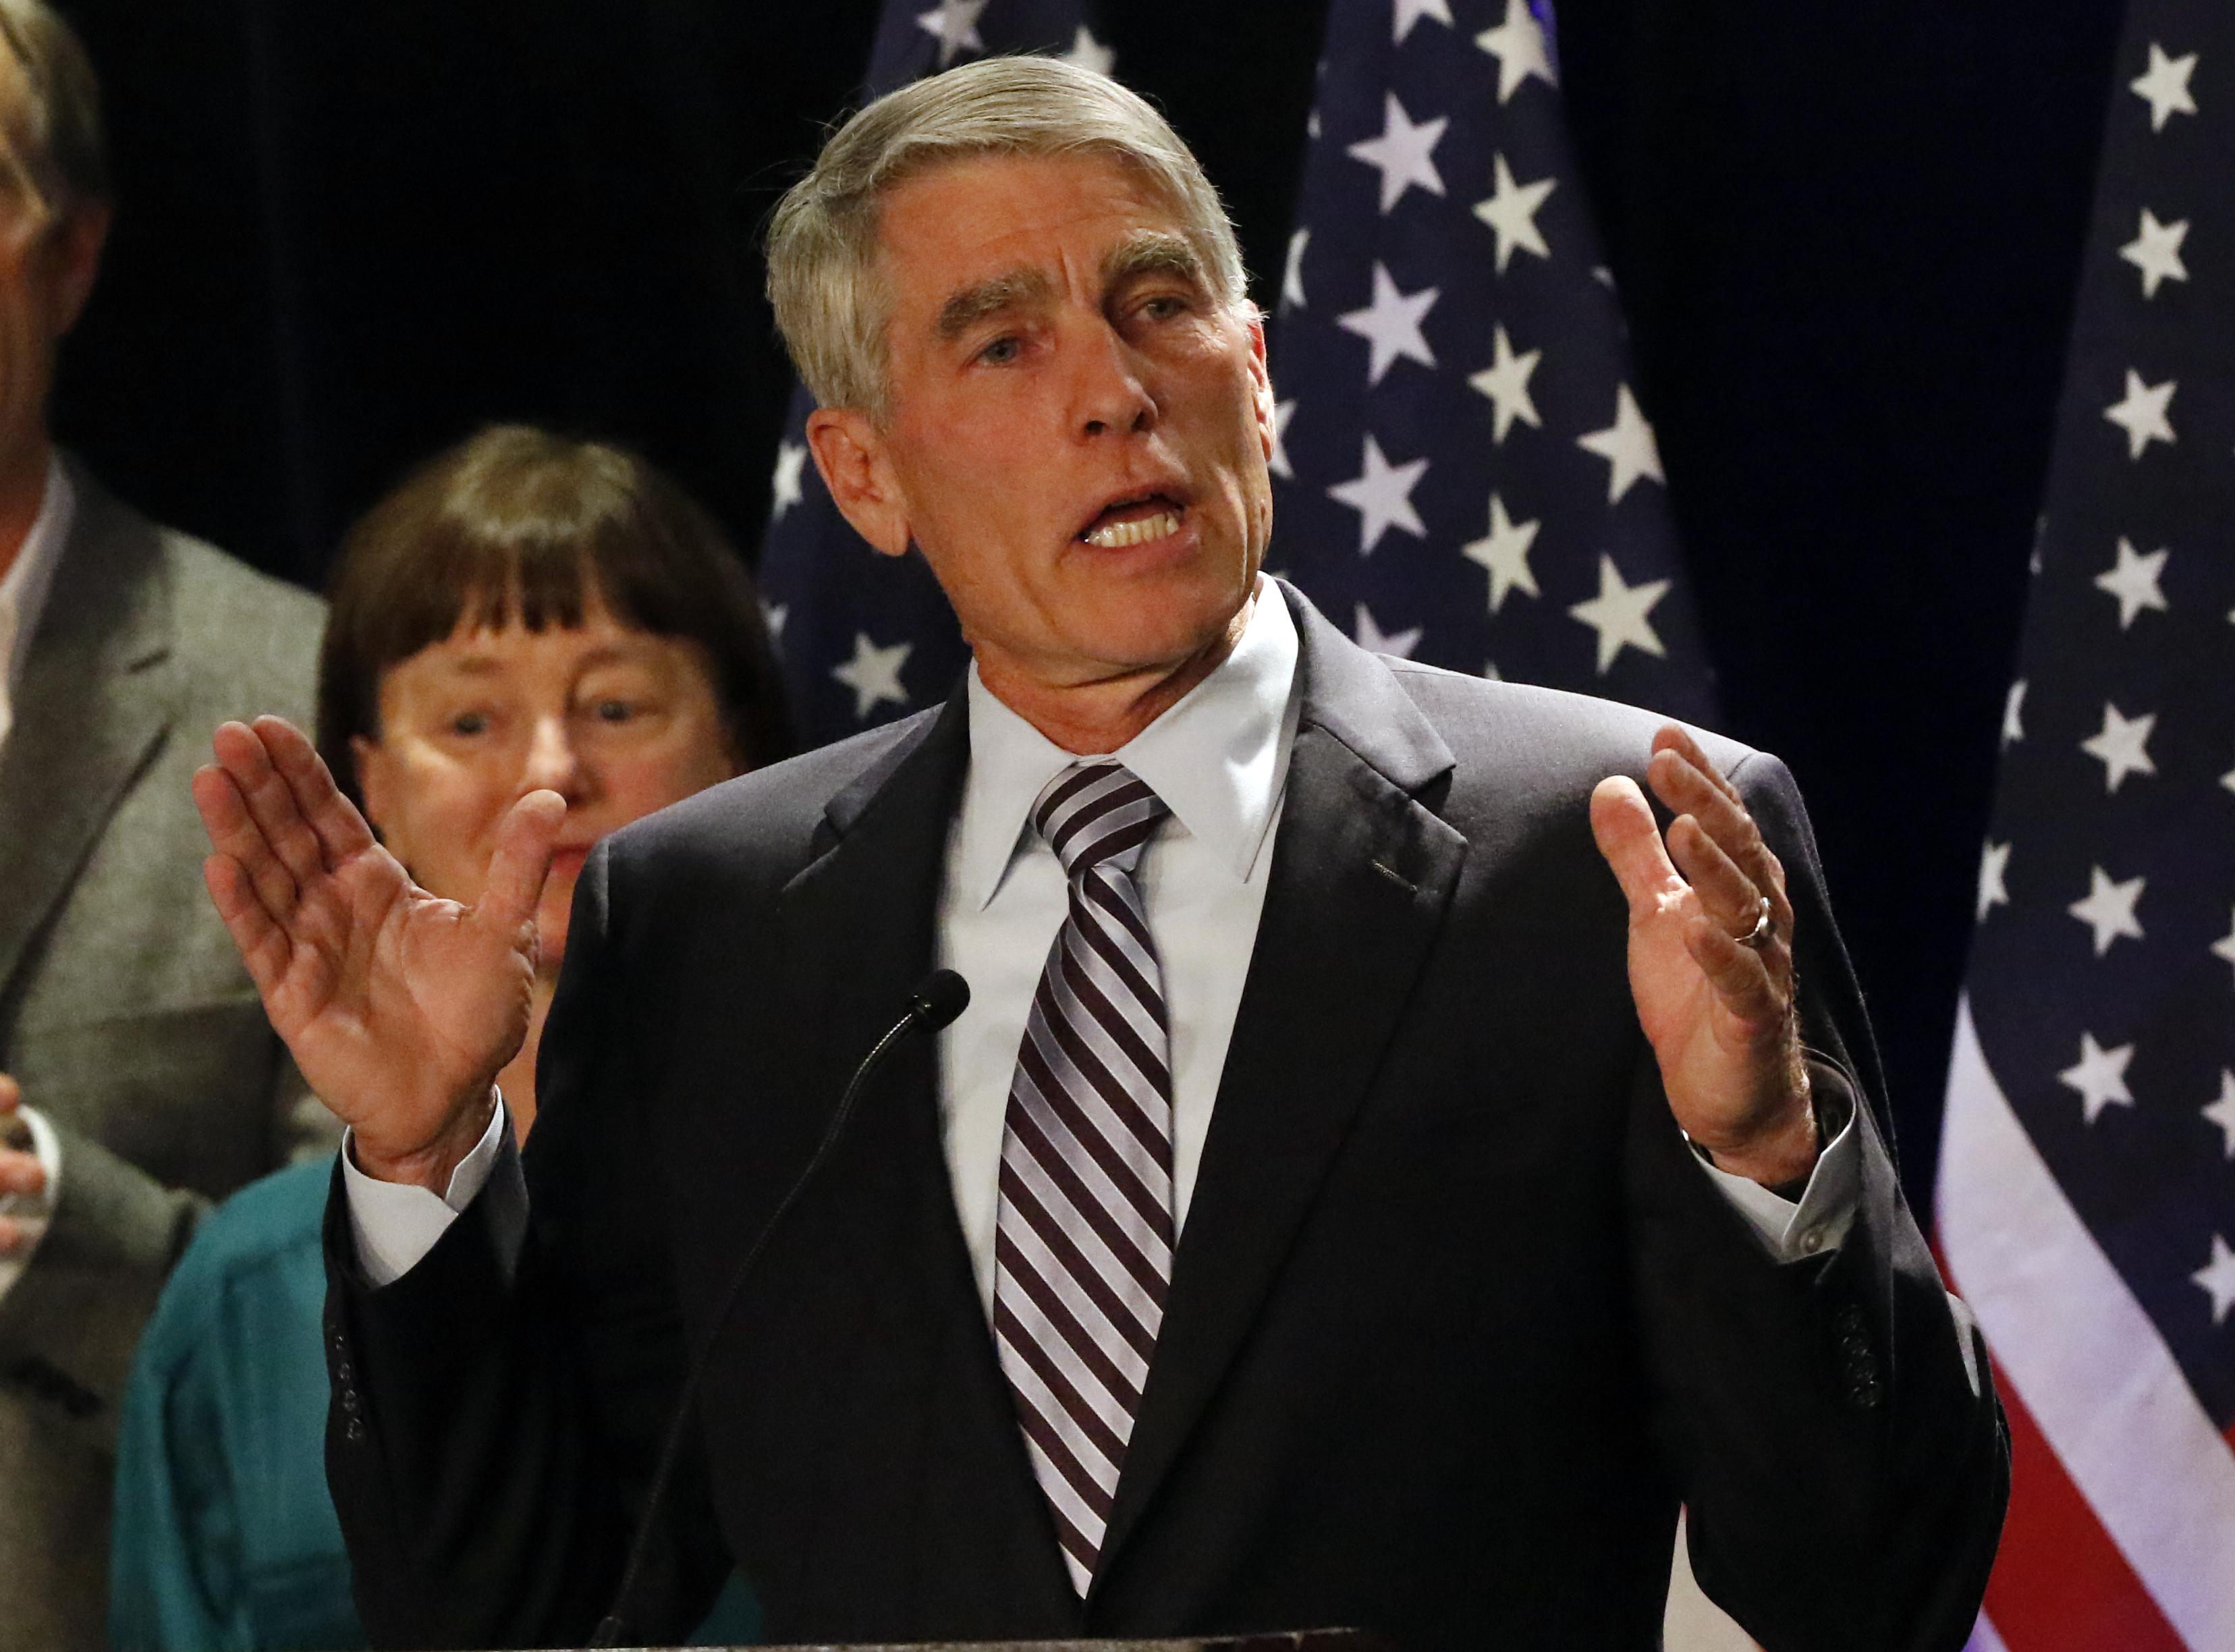 Photo: Sen. Mark Udall's concession speech (AP Photo)